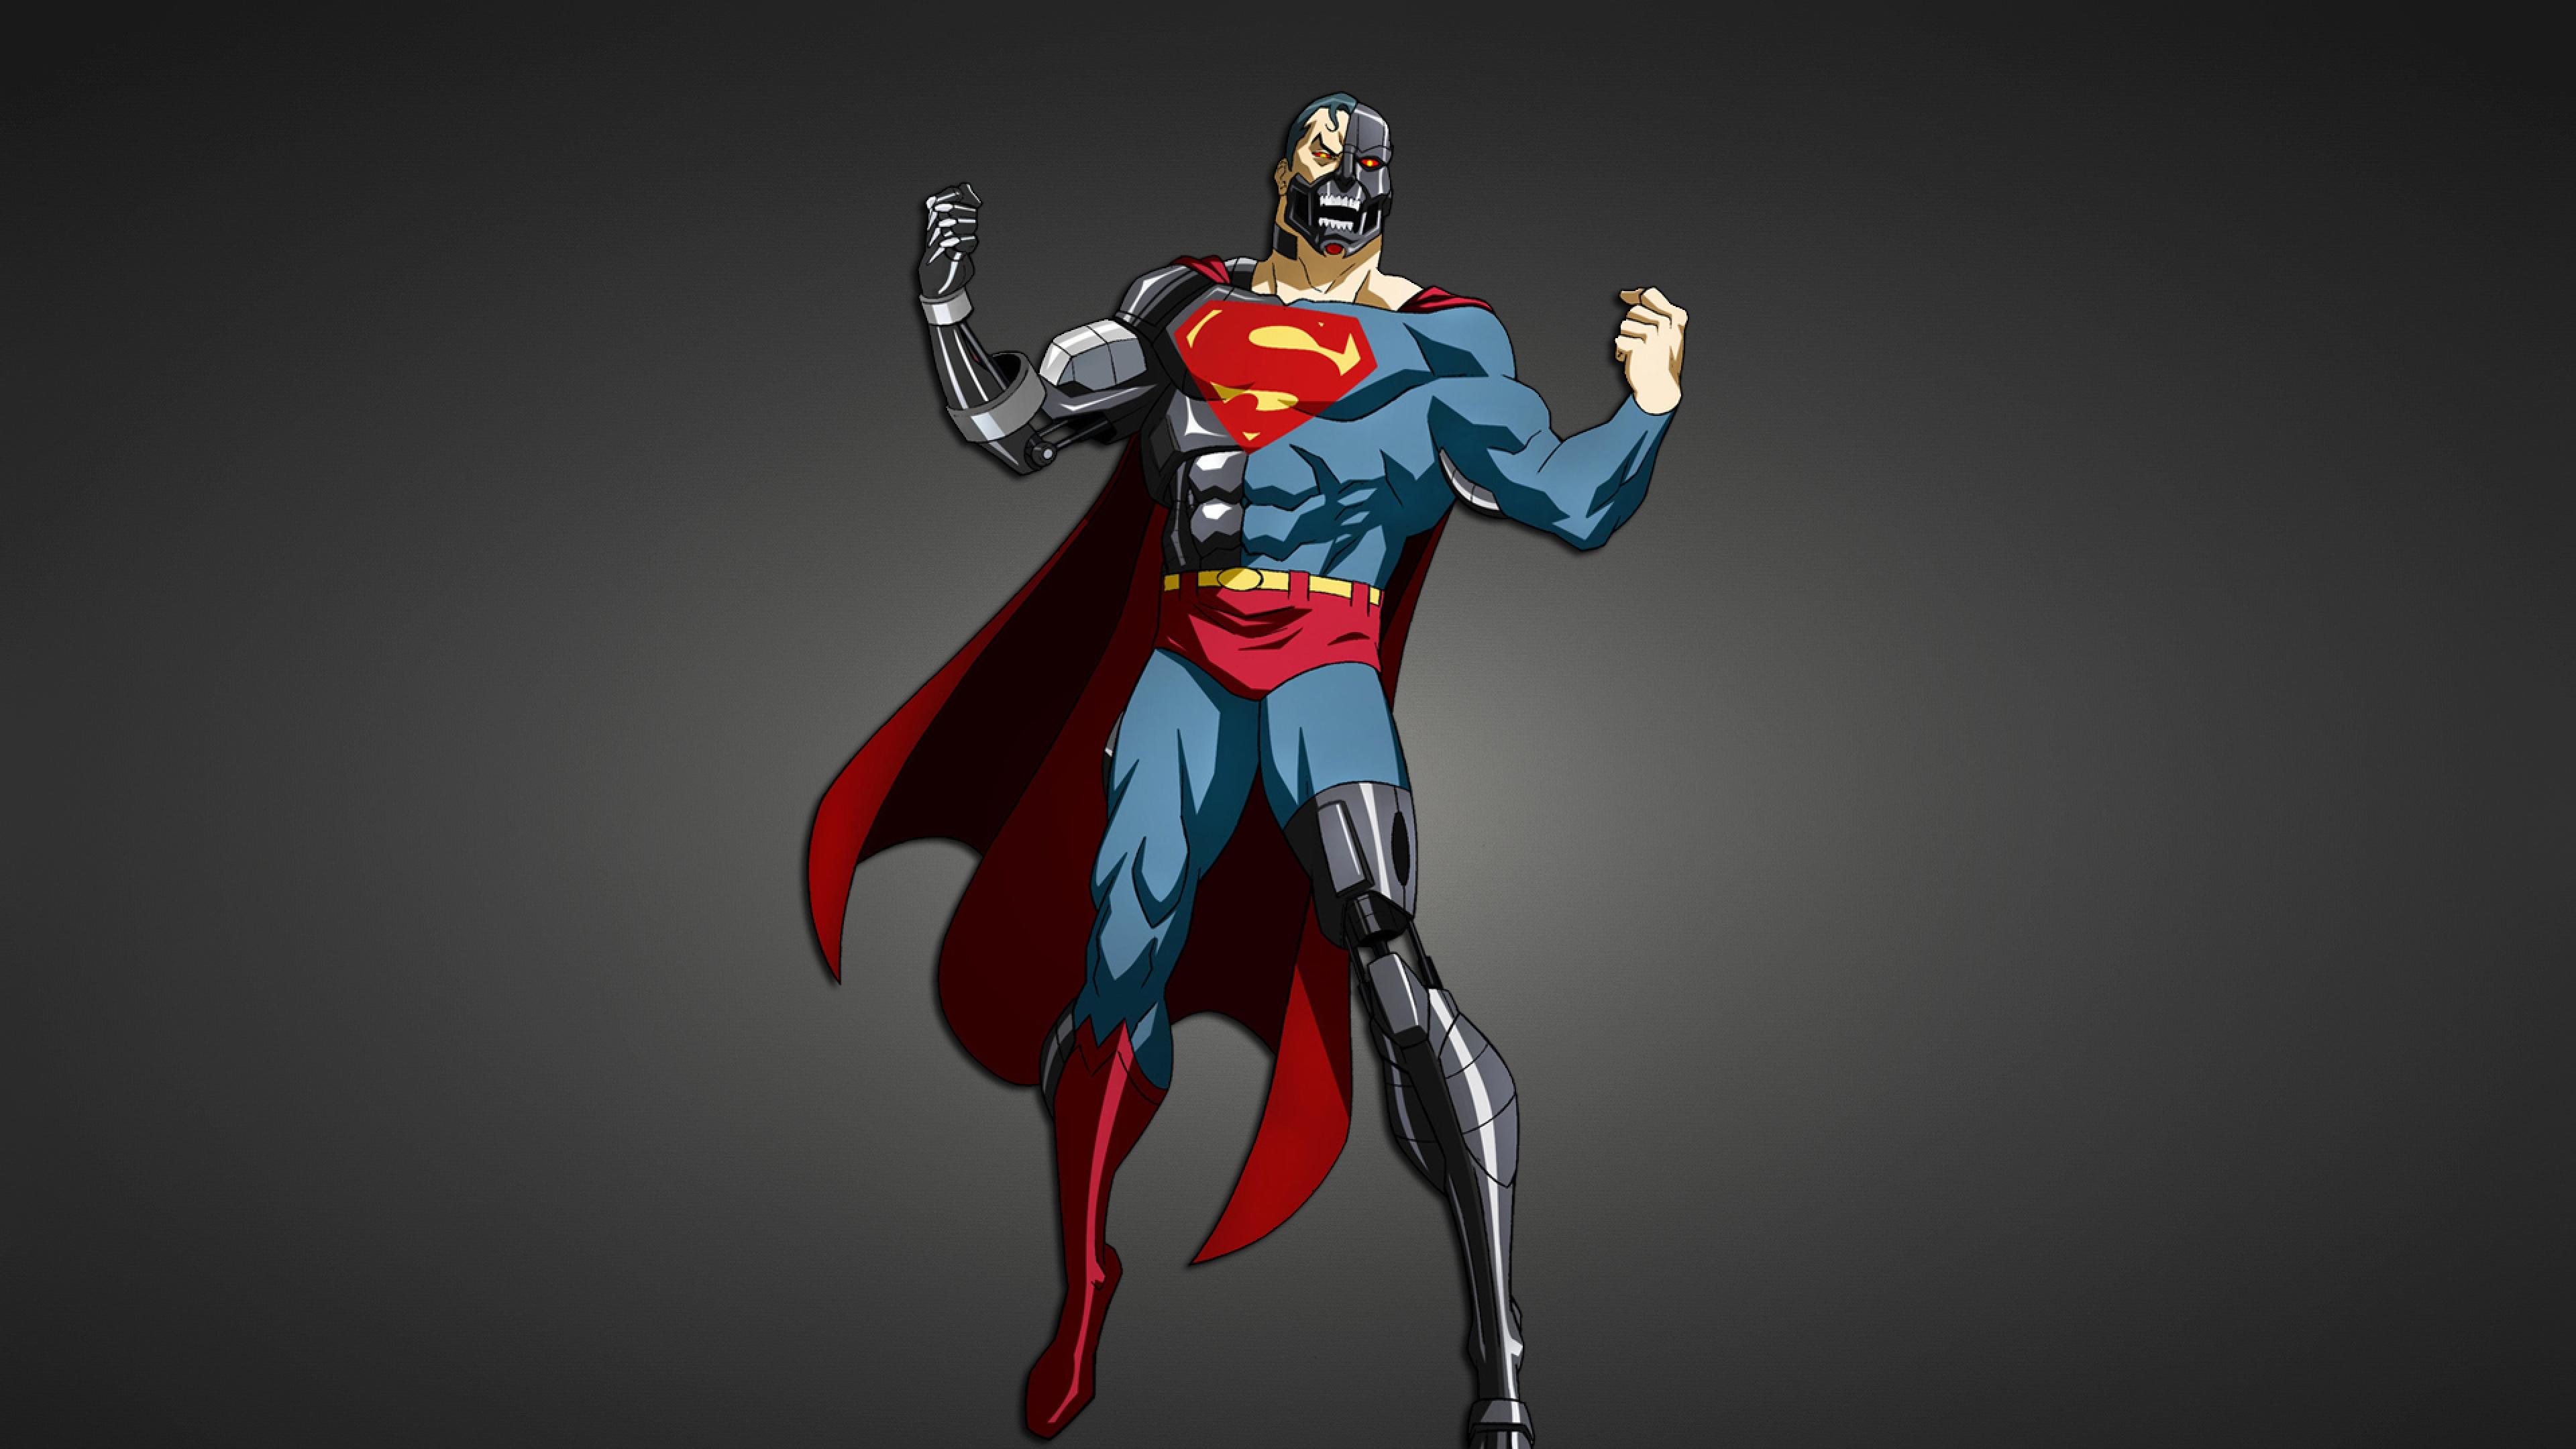 Superhero Wallpaper HD 3840x2160